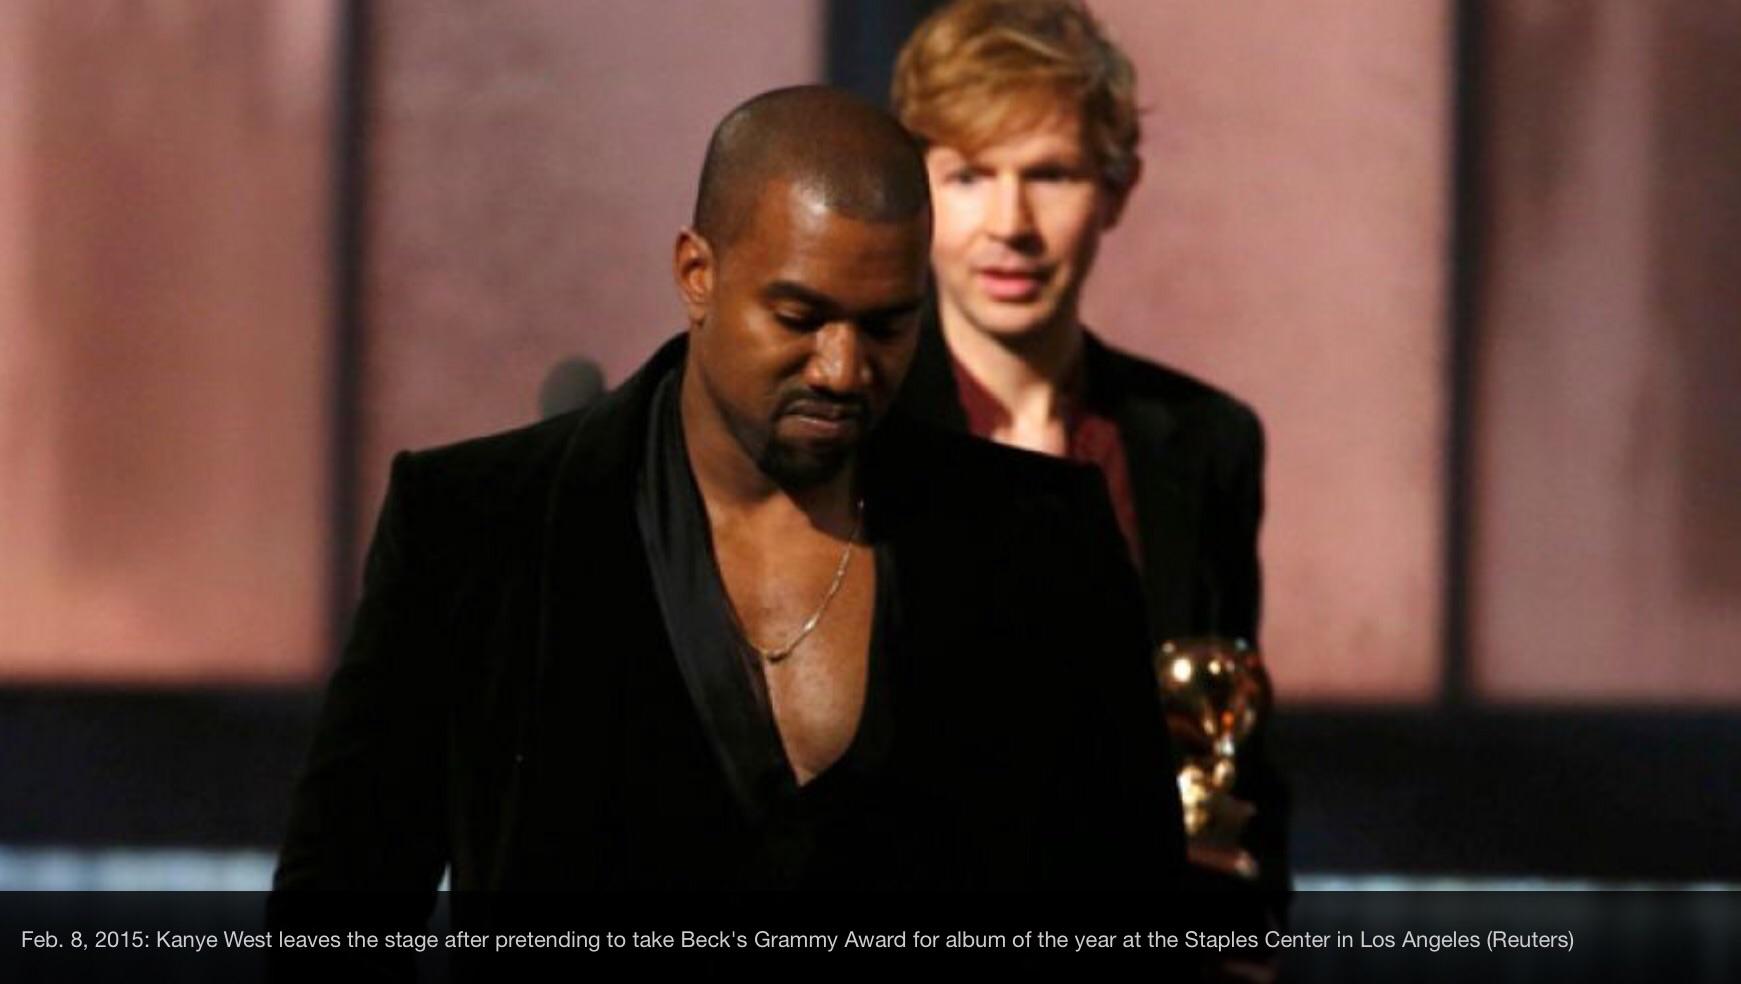 Kanye West 2005 Grammy Speech